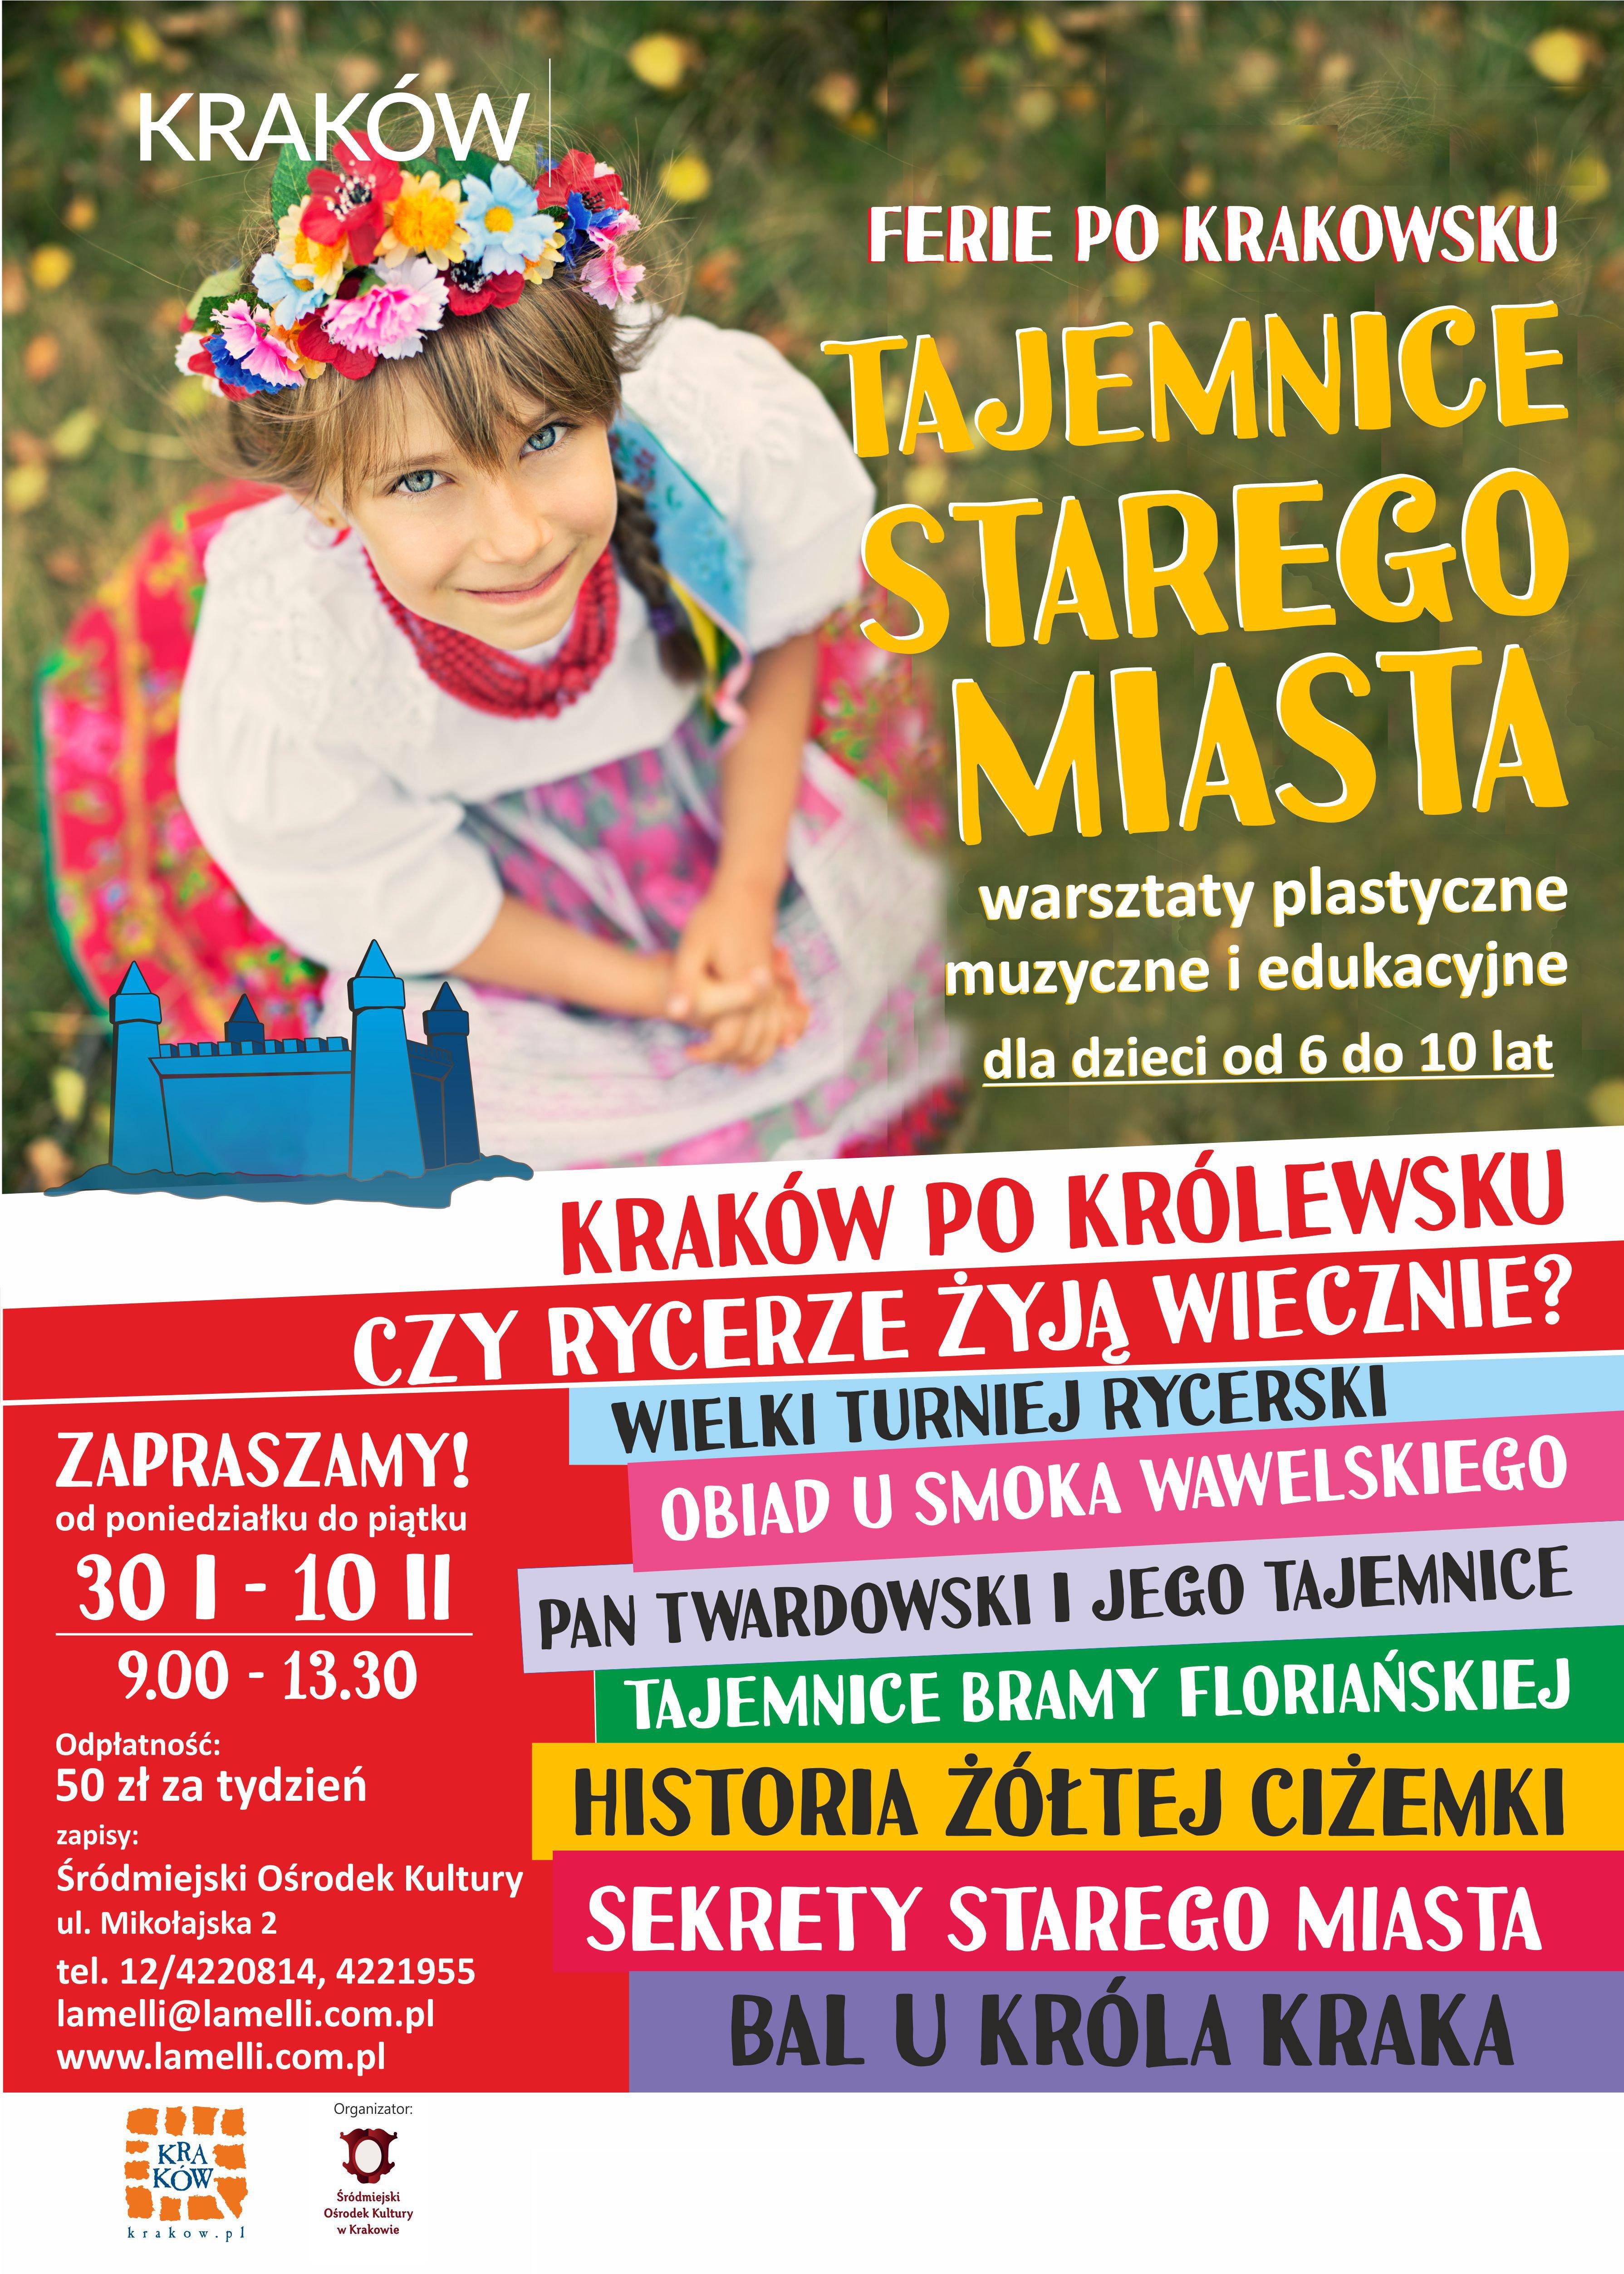 Ferie po krakowsku Tajemnice Starego Miasta